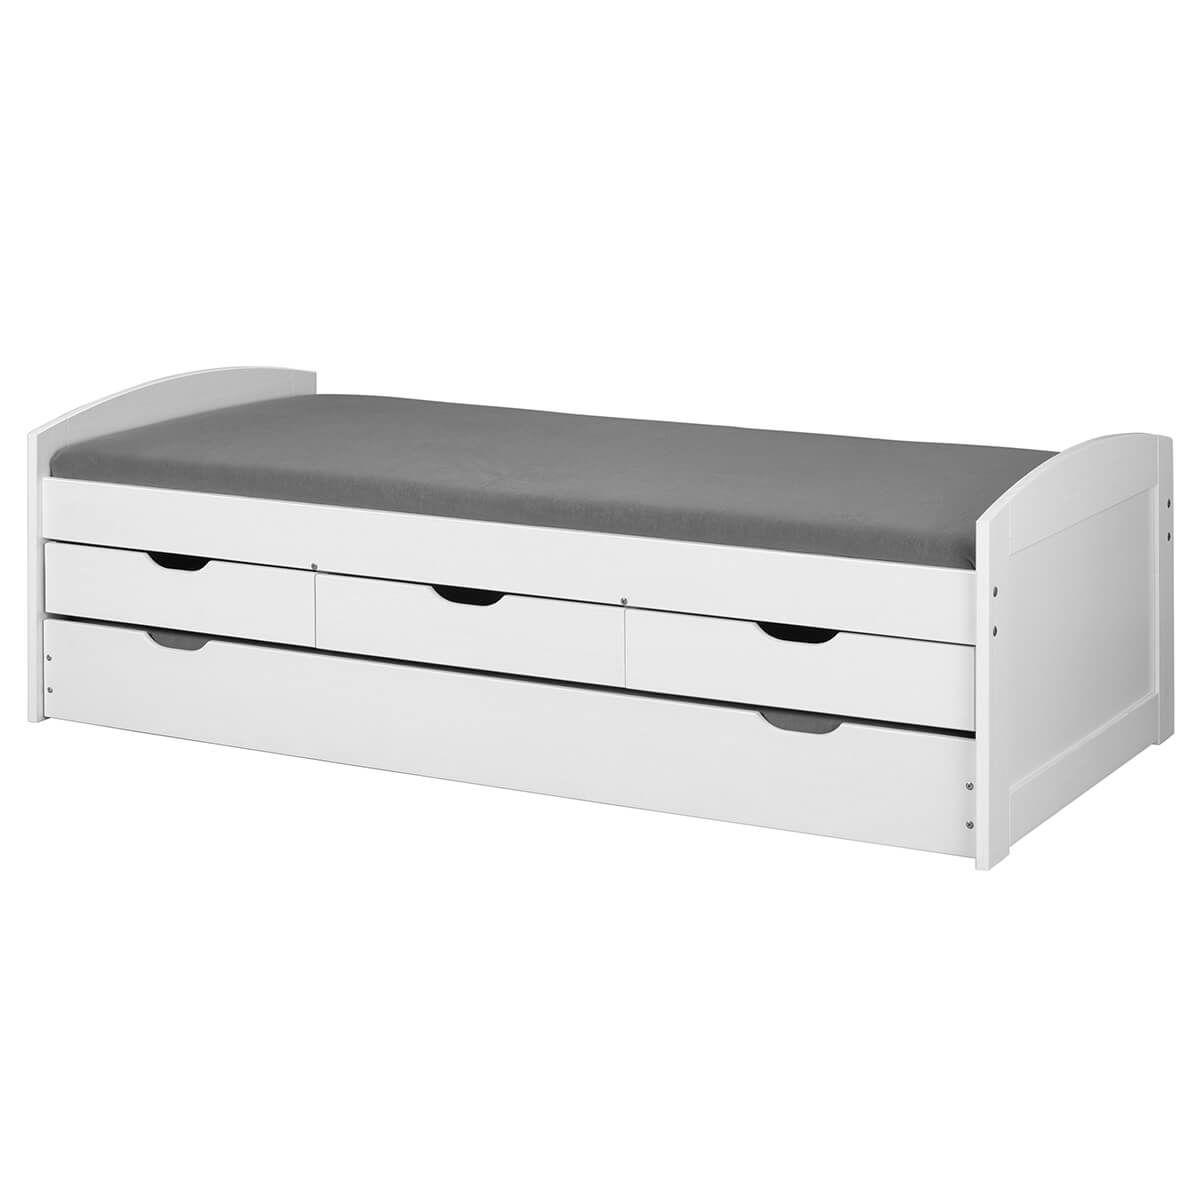 Lit 90x200 gigogne + 3 tiroirs